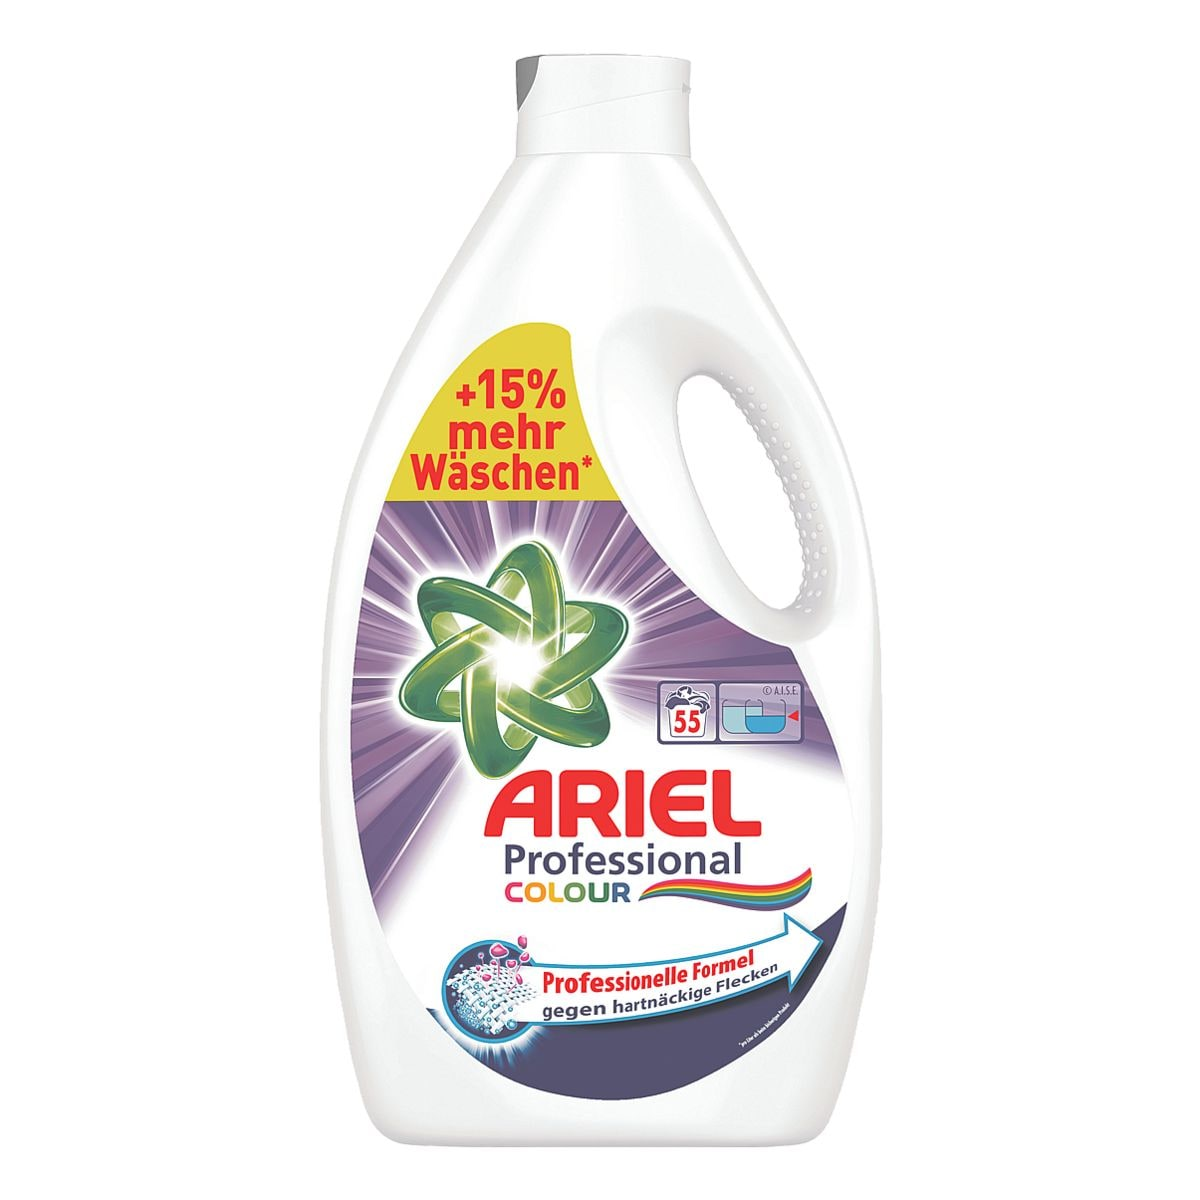 ARIEL Waschmittel »Ariel Professional Colour« 55 WL